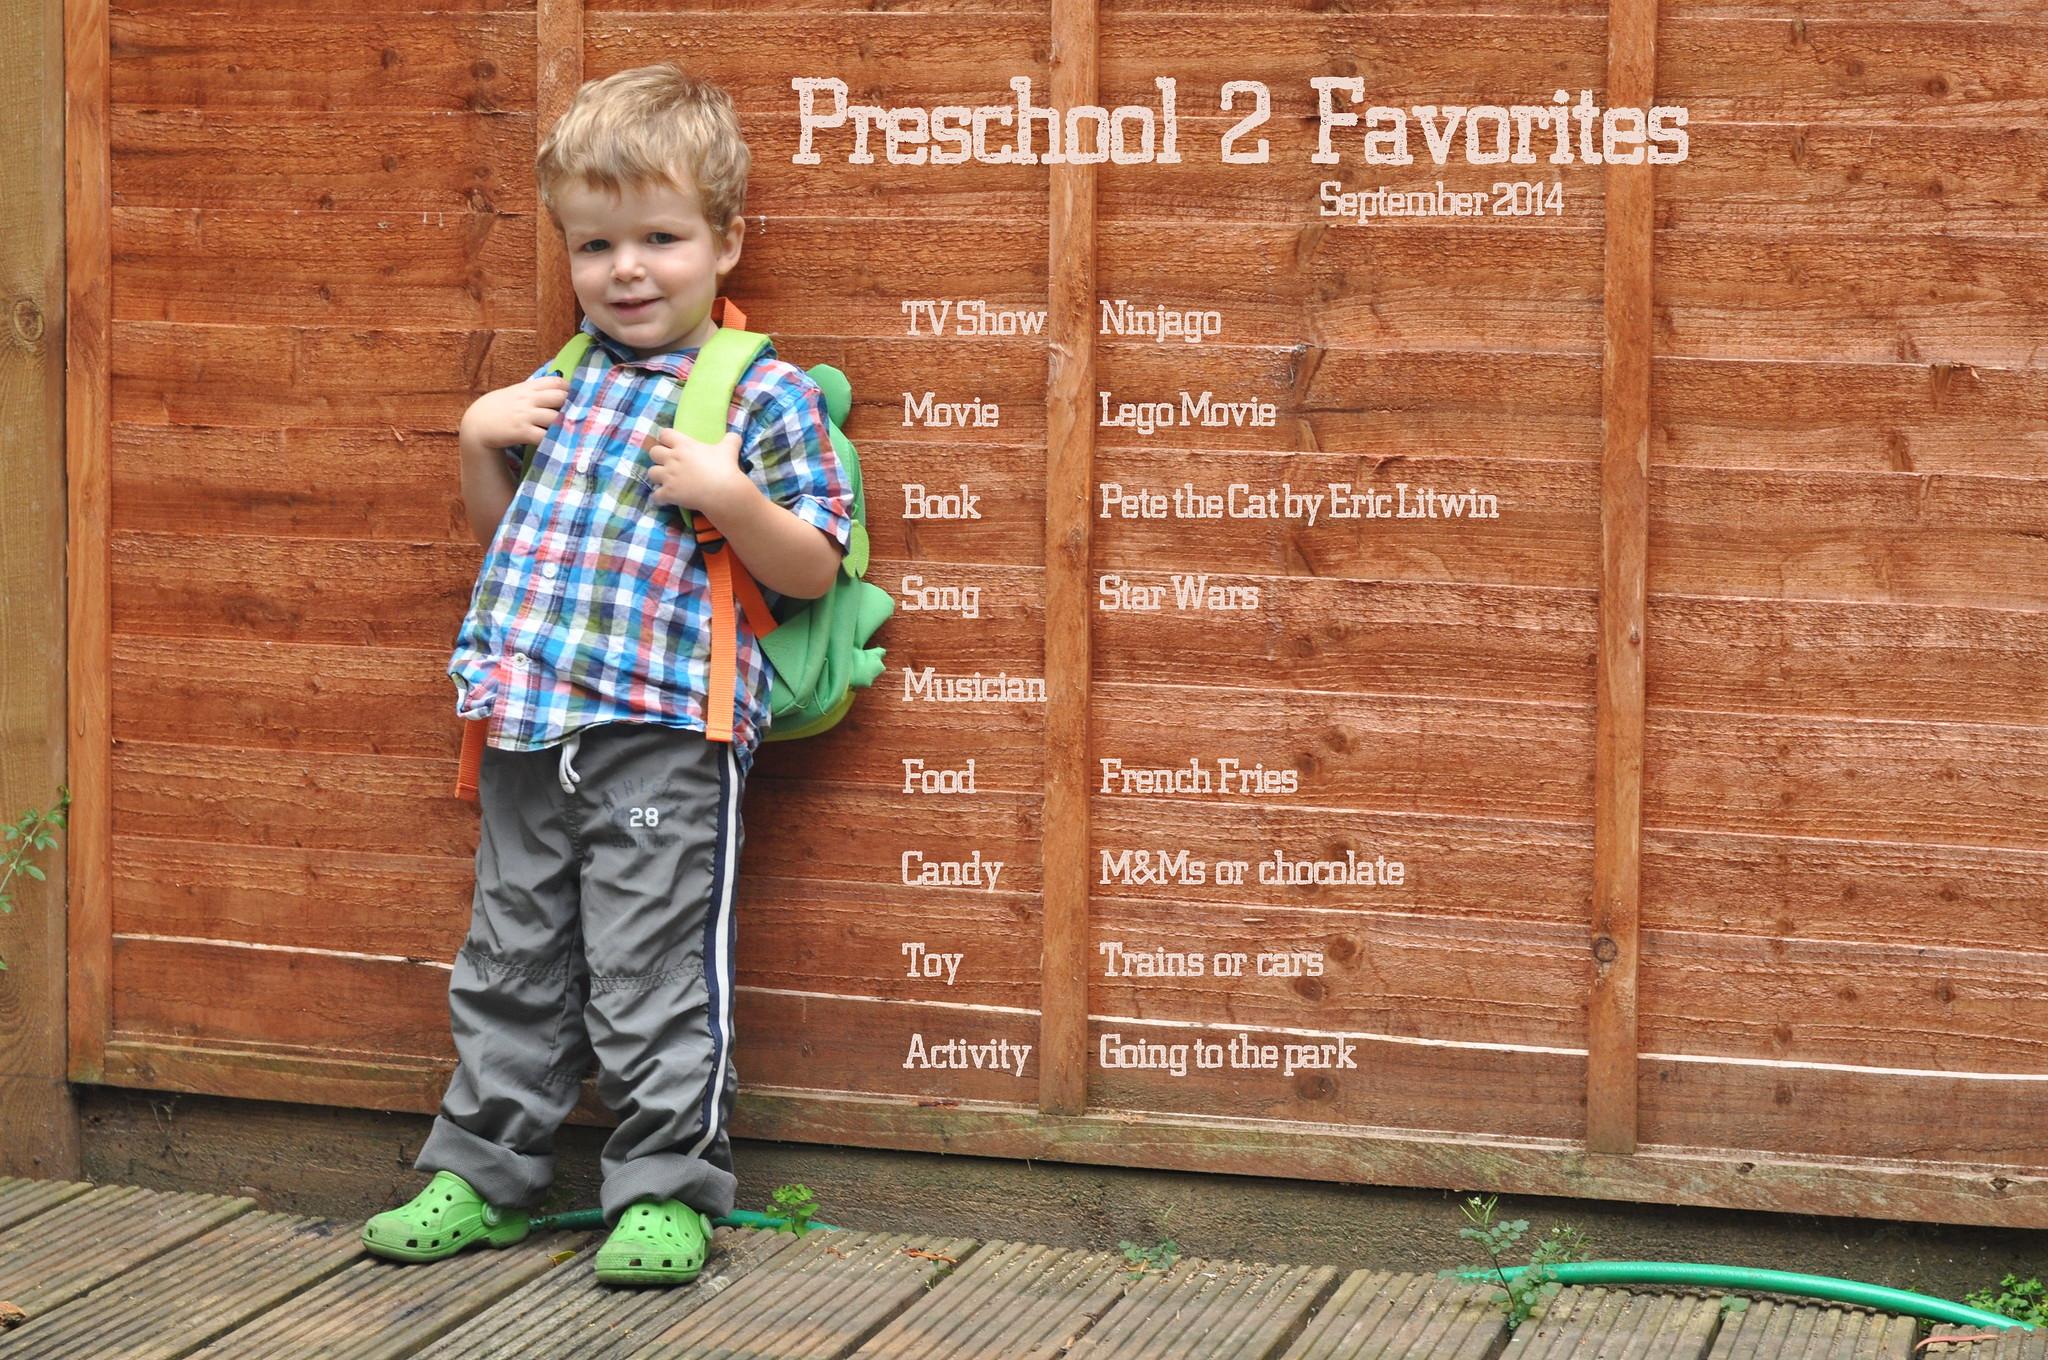 Reid - Preschool 2